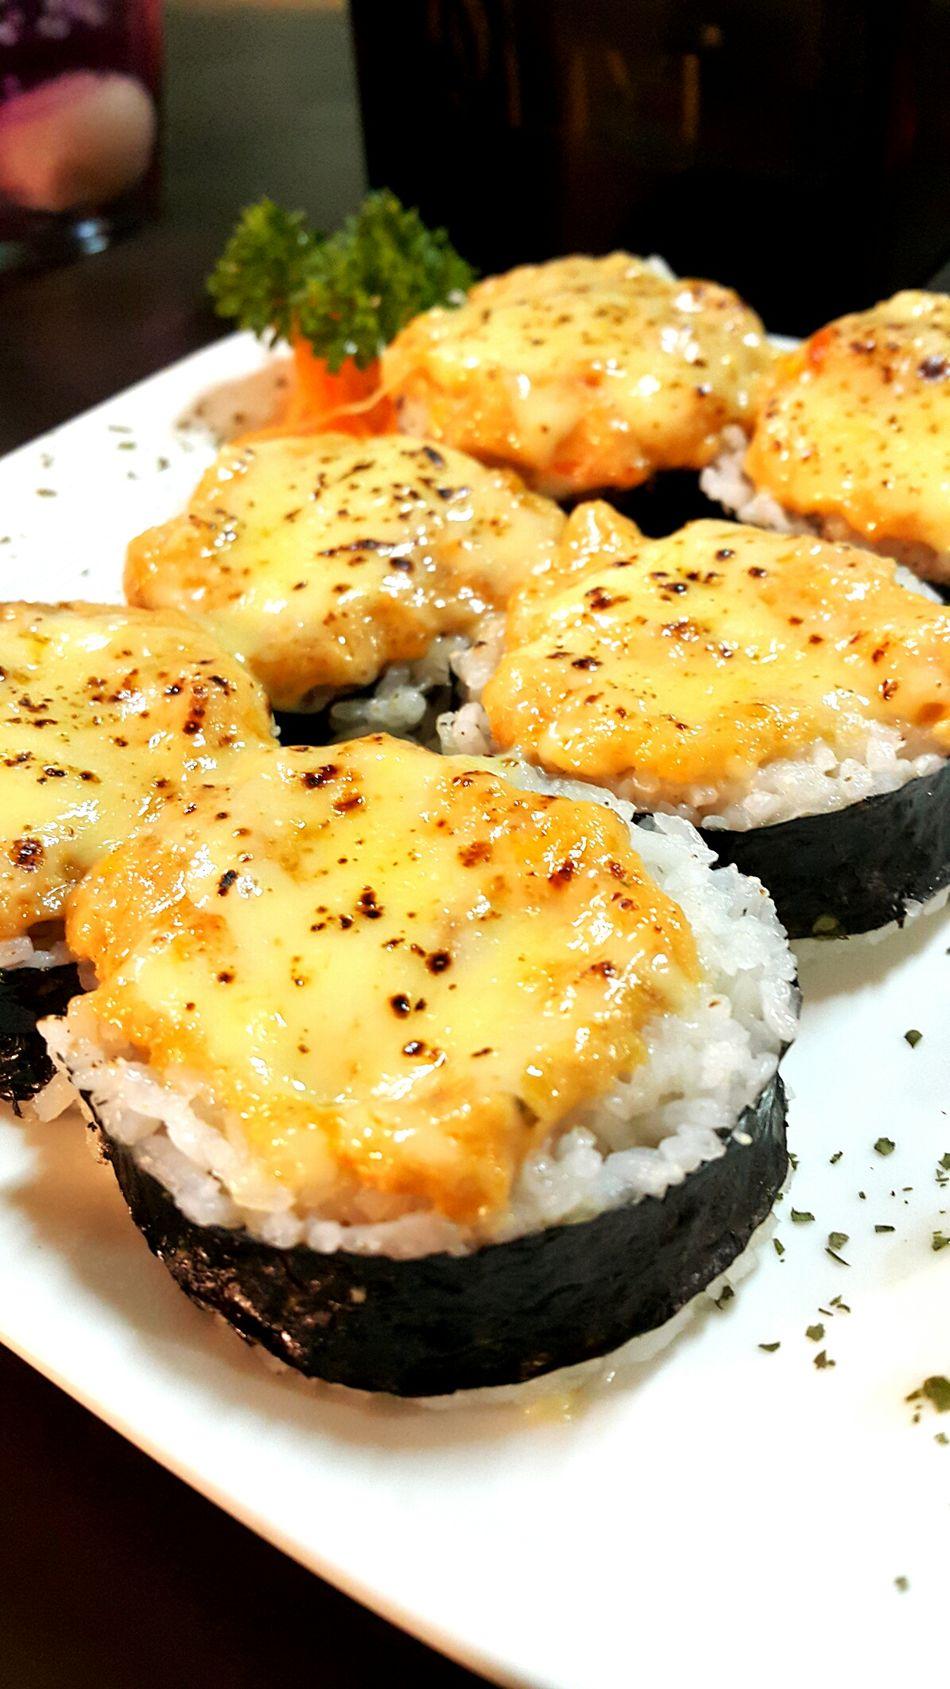 Sushi Sushiporn Foodphotography Foodgasm Food Porn Food Market Japanese Food MozarellaCheese Salmon Sushi Seaweed Delicious Nori